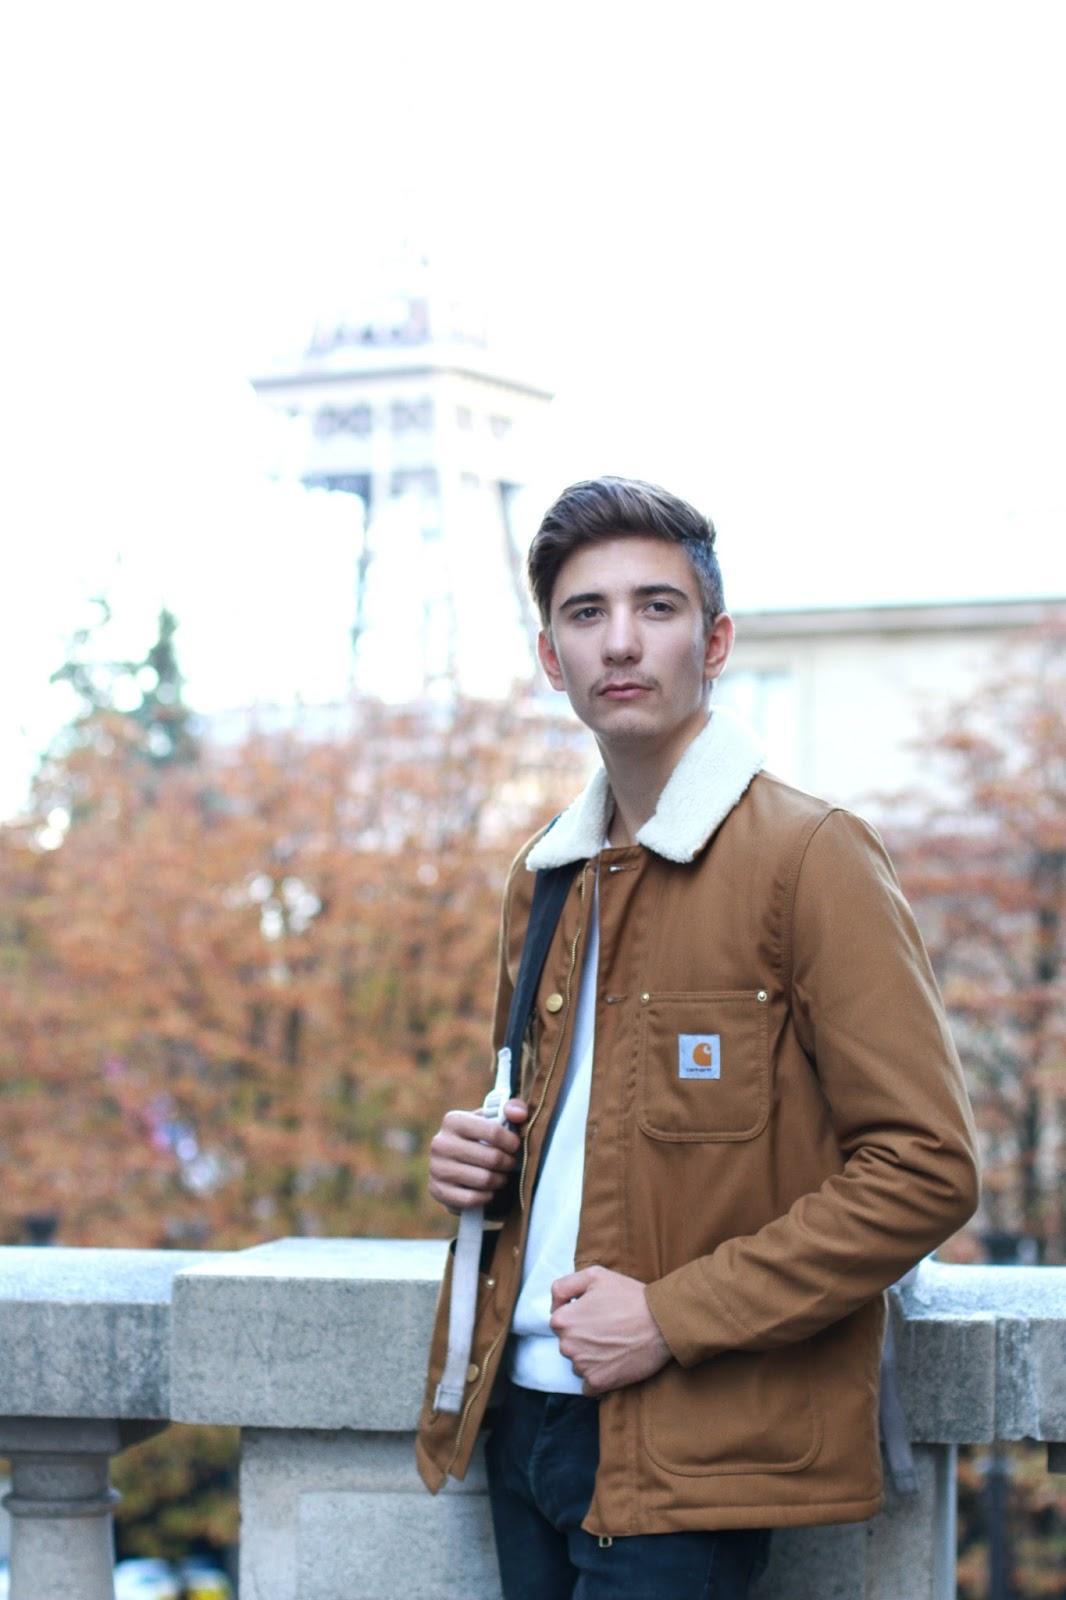 guillaume-mayer-vilerance-blog-mode-homme-tendances